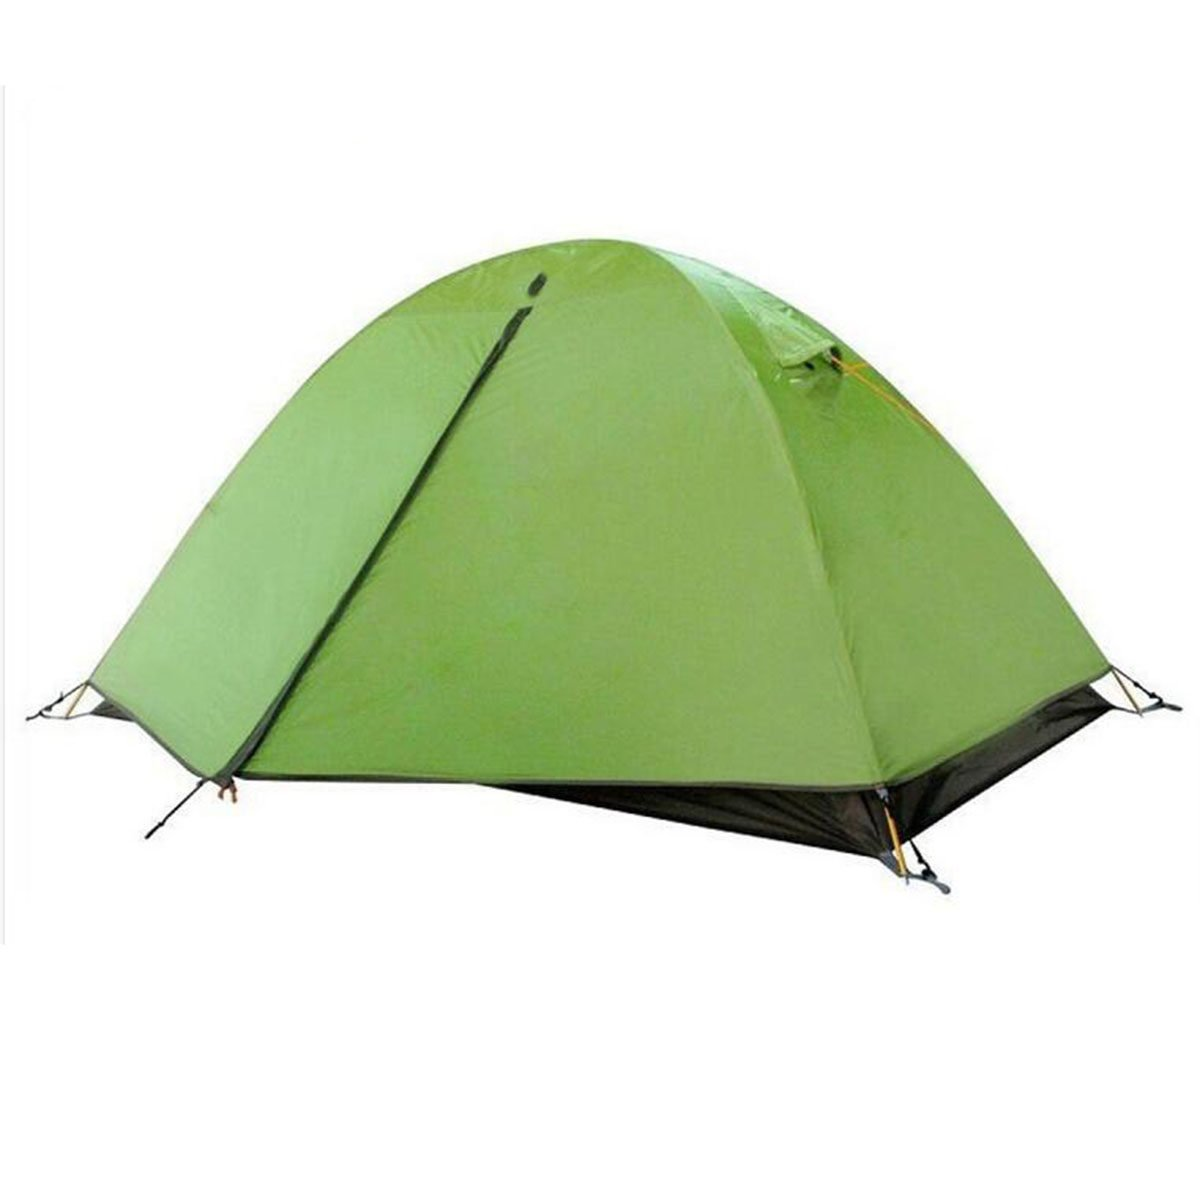 TZQ Ultra-light Doppel-Paar Partner Doppel Zijia Sie Camping Zelte,Grün